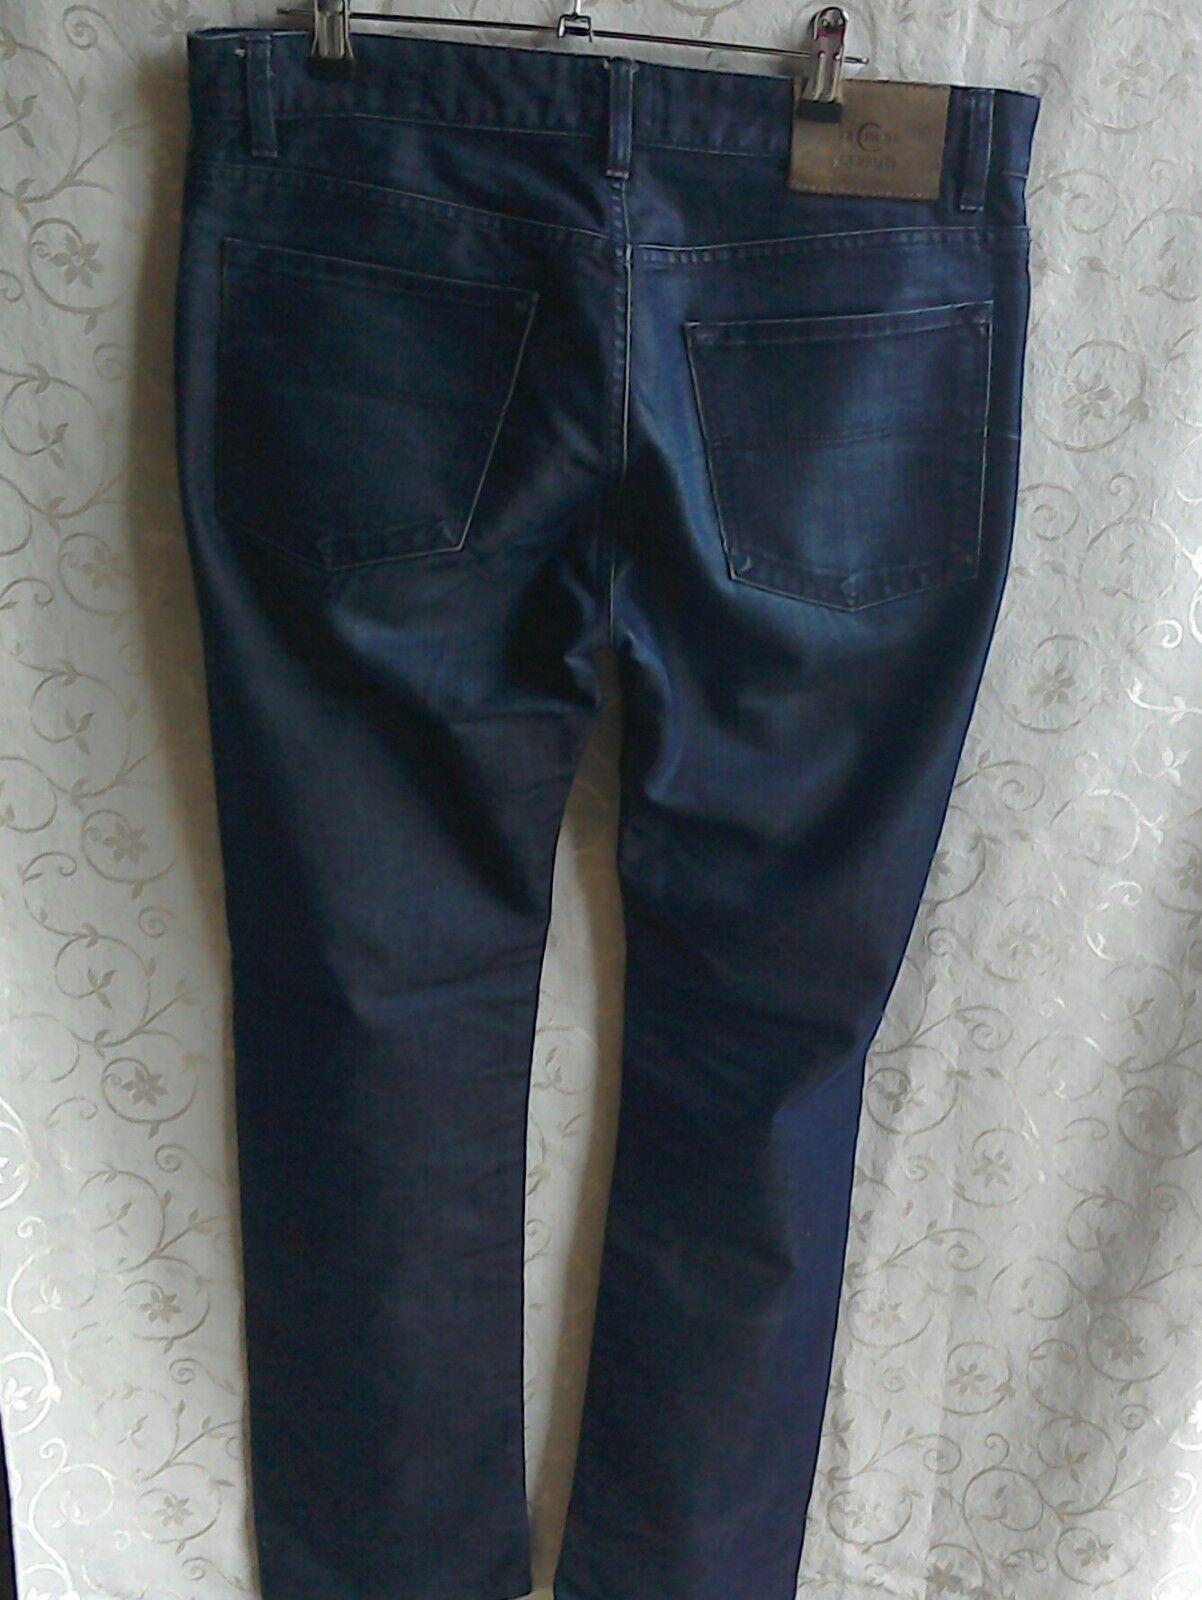 Da Uomo Cerruti 1881 blu Jeans... Girovita 34... all'interno gamba 30